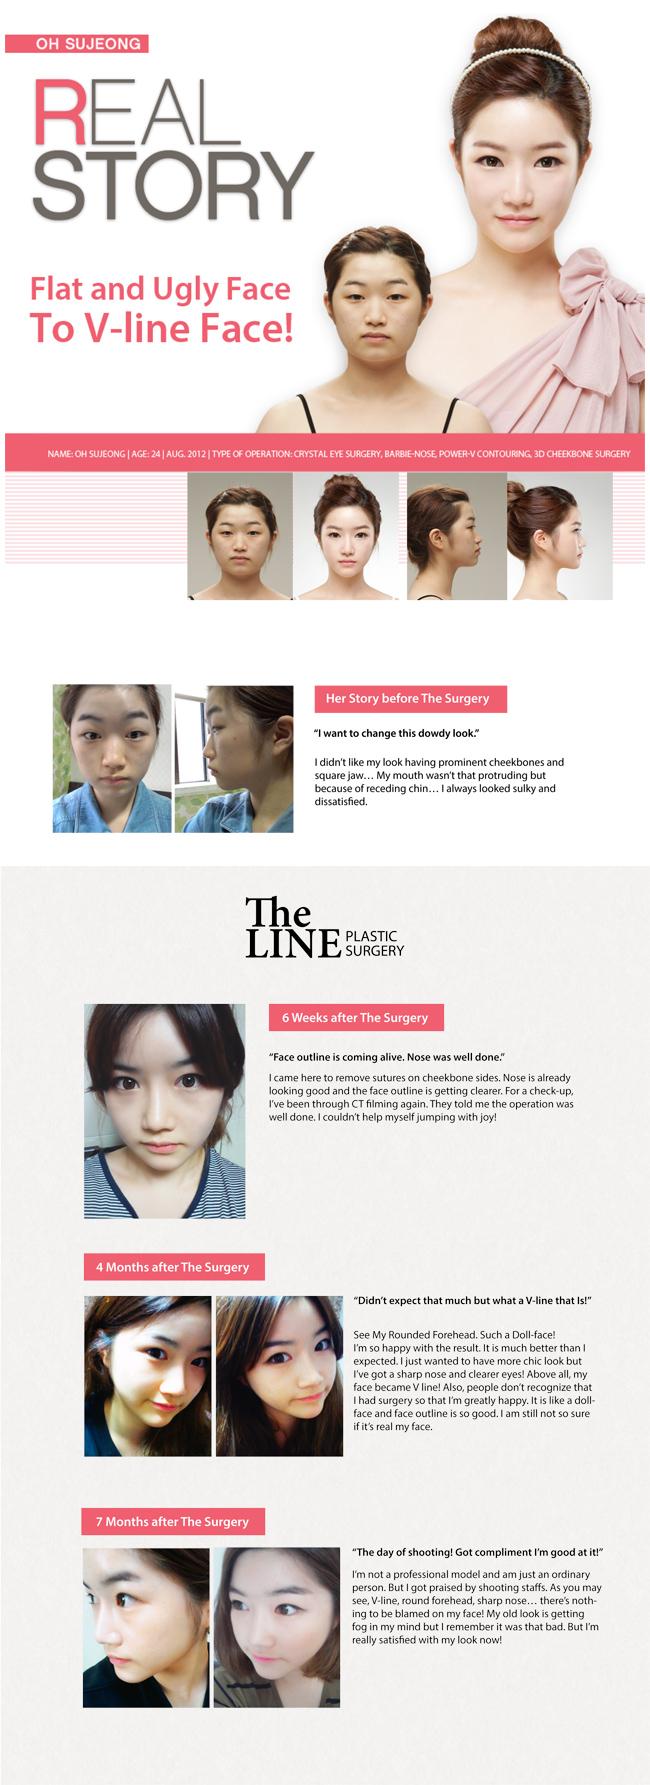 Real Story of Oh, Su Jeong